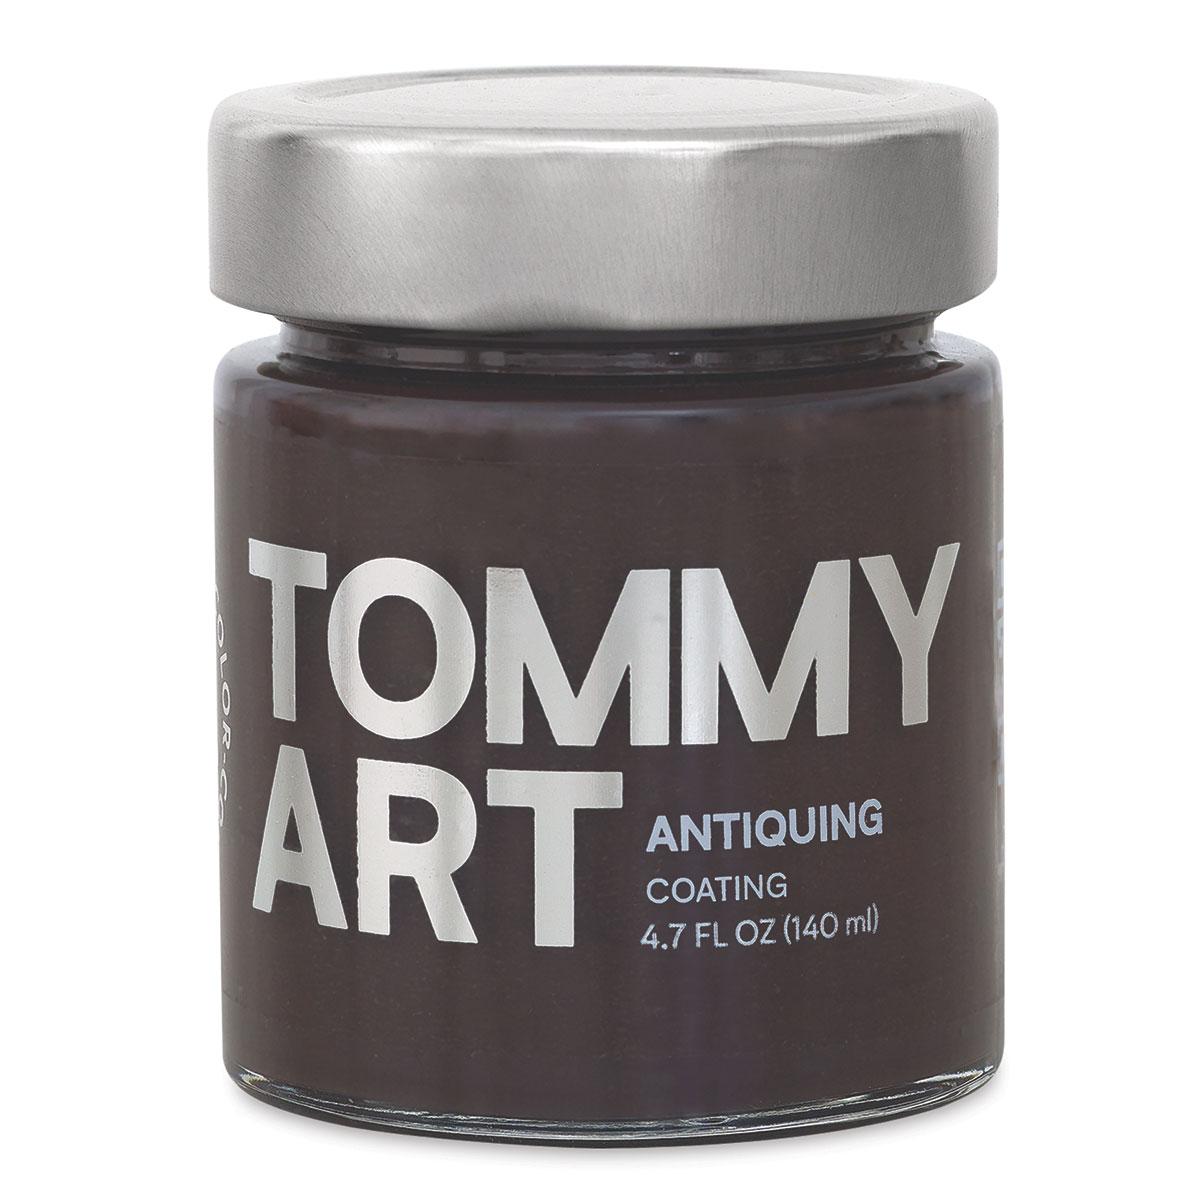 Tommy Art DIY System - Antiquing Coating, 140 ml